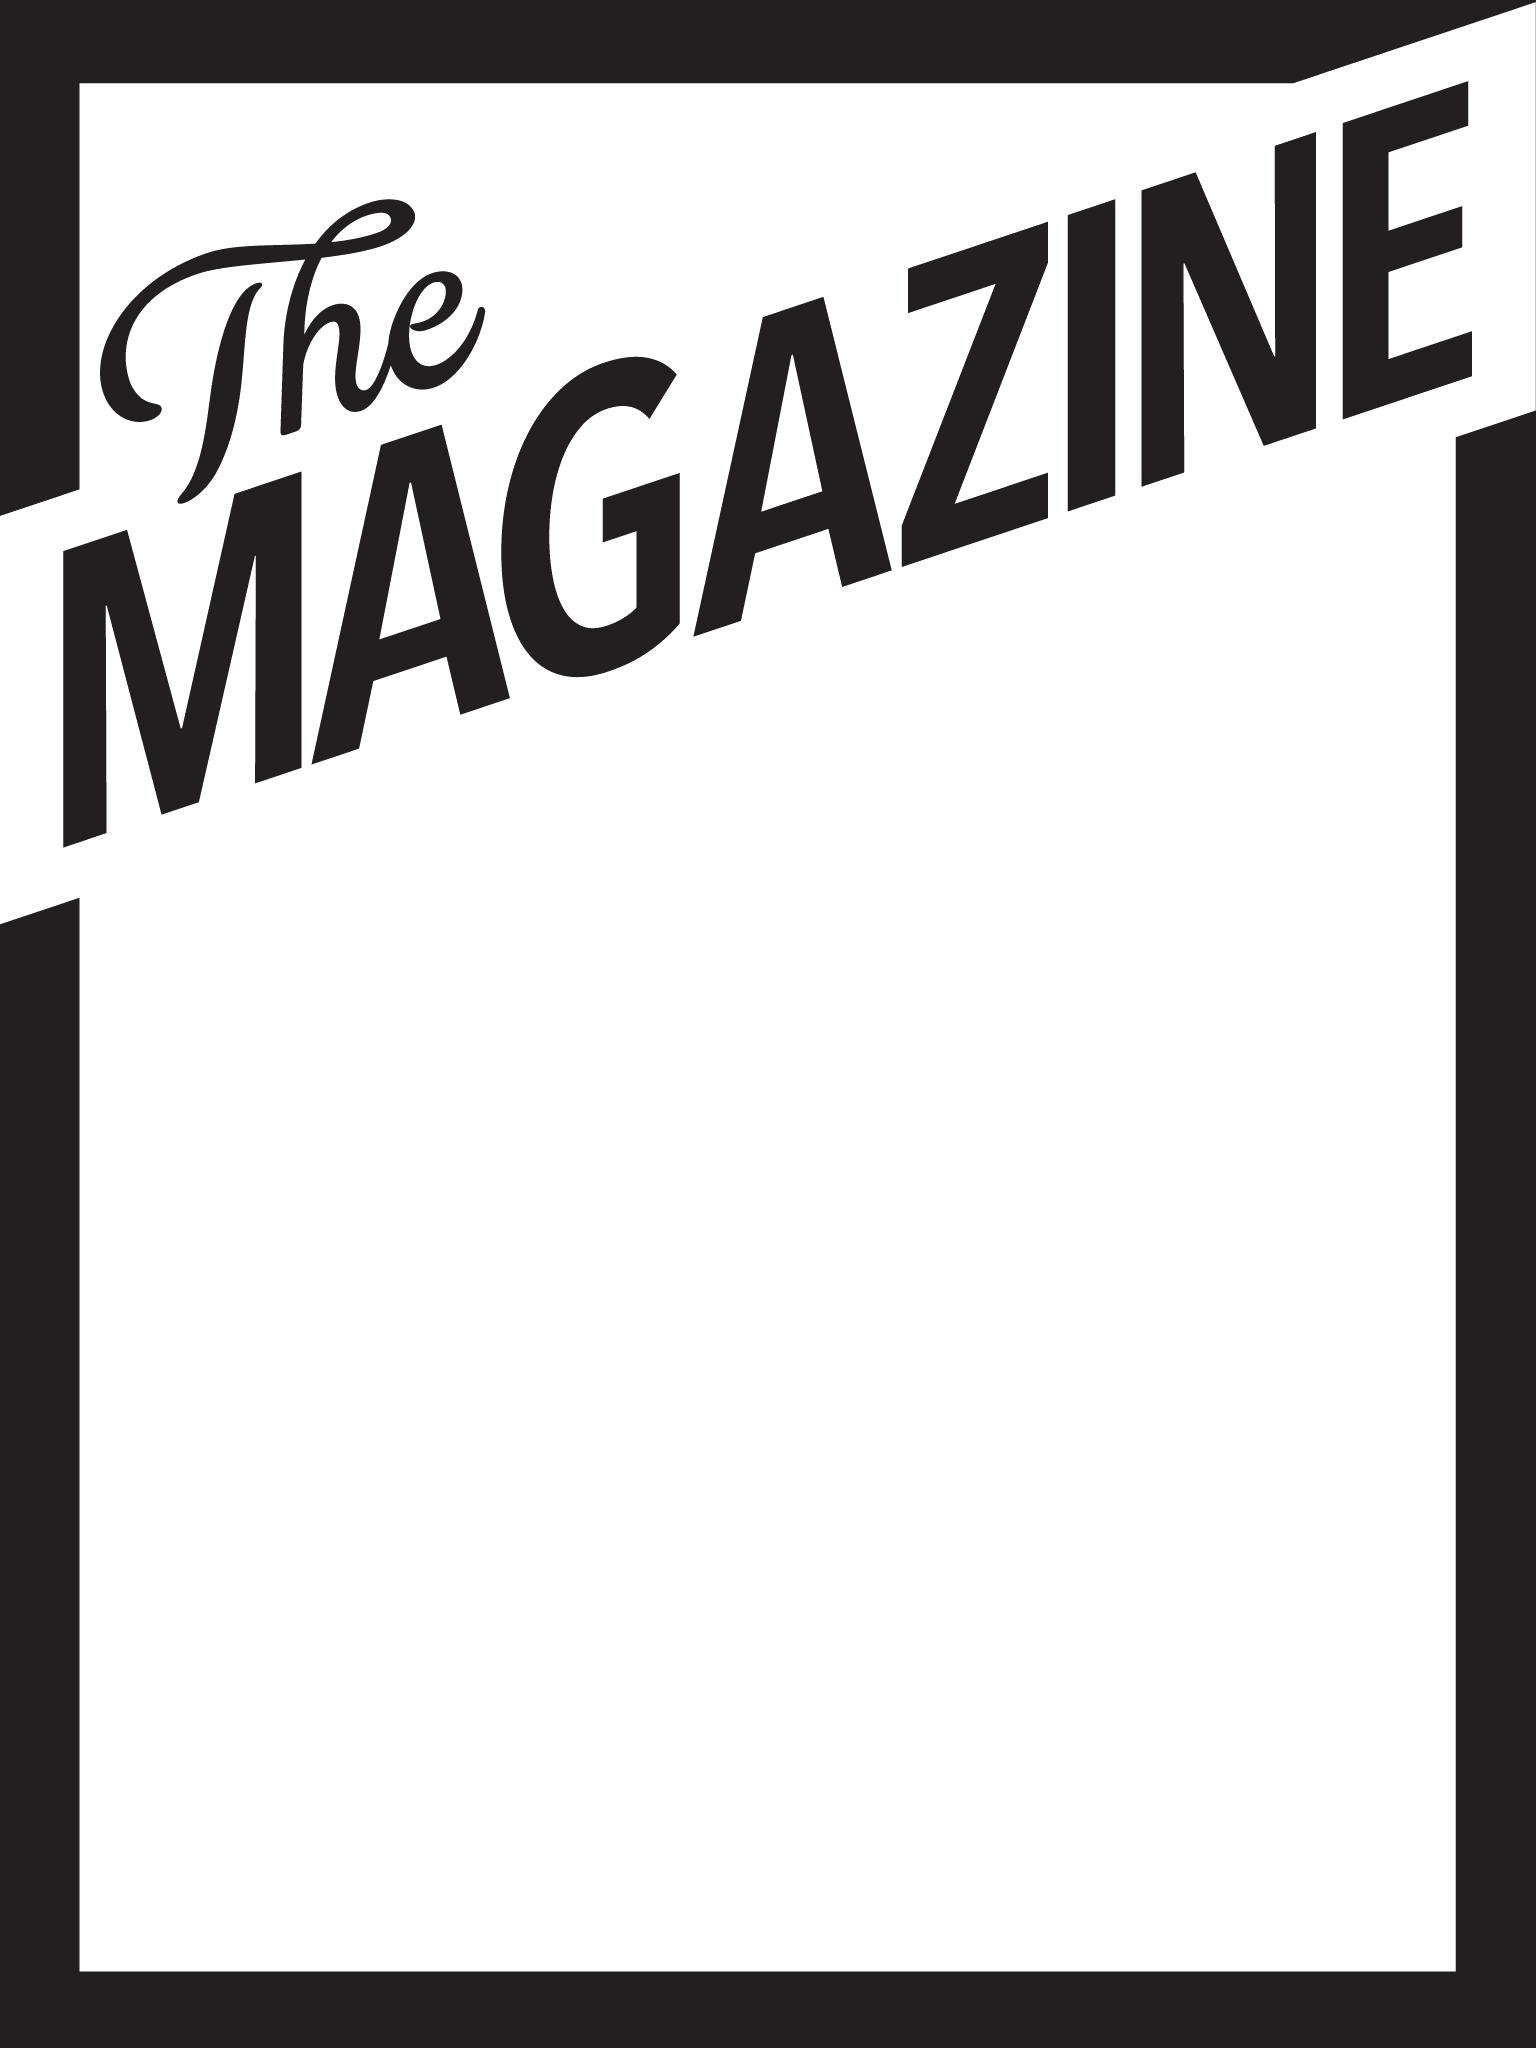 Magazine Cover Templates Free. 10 free magazine cover templates ...